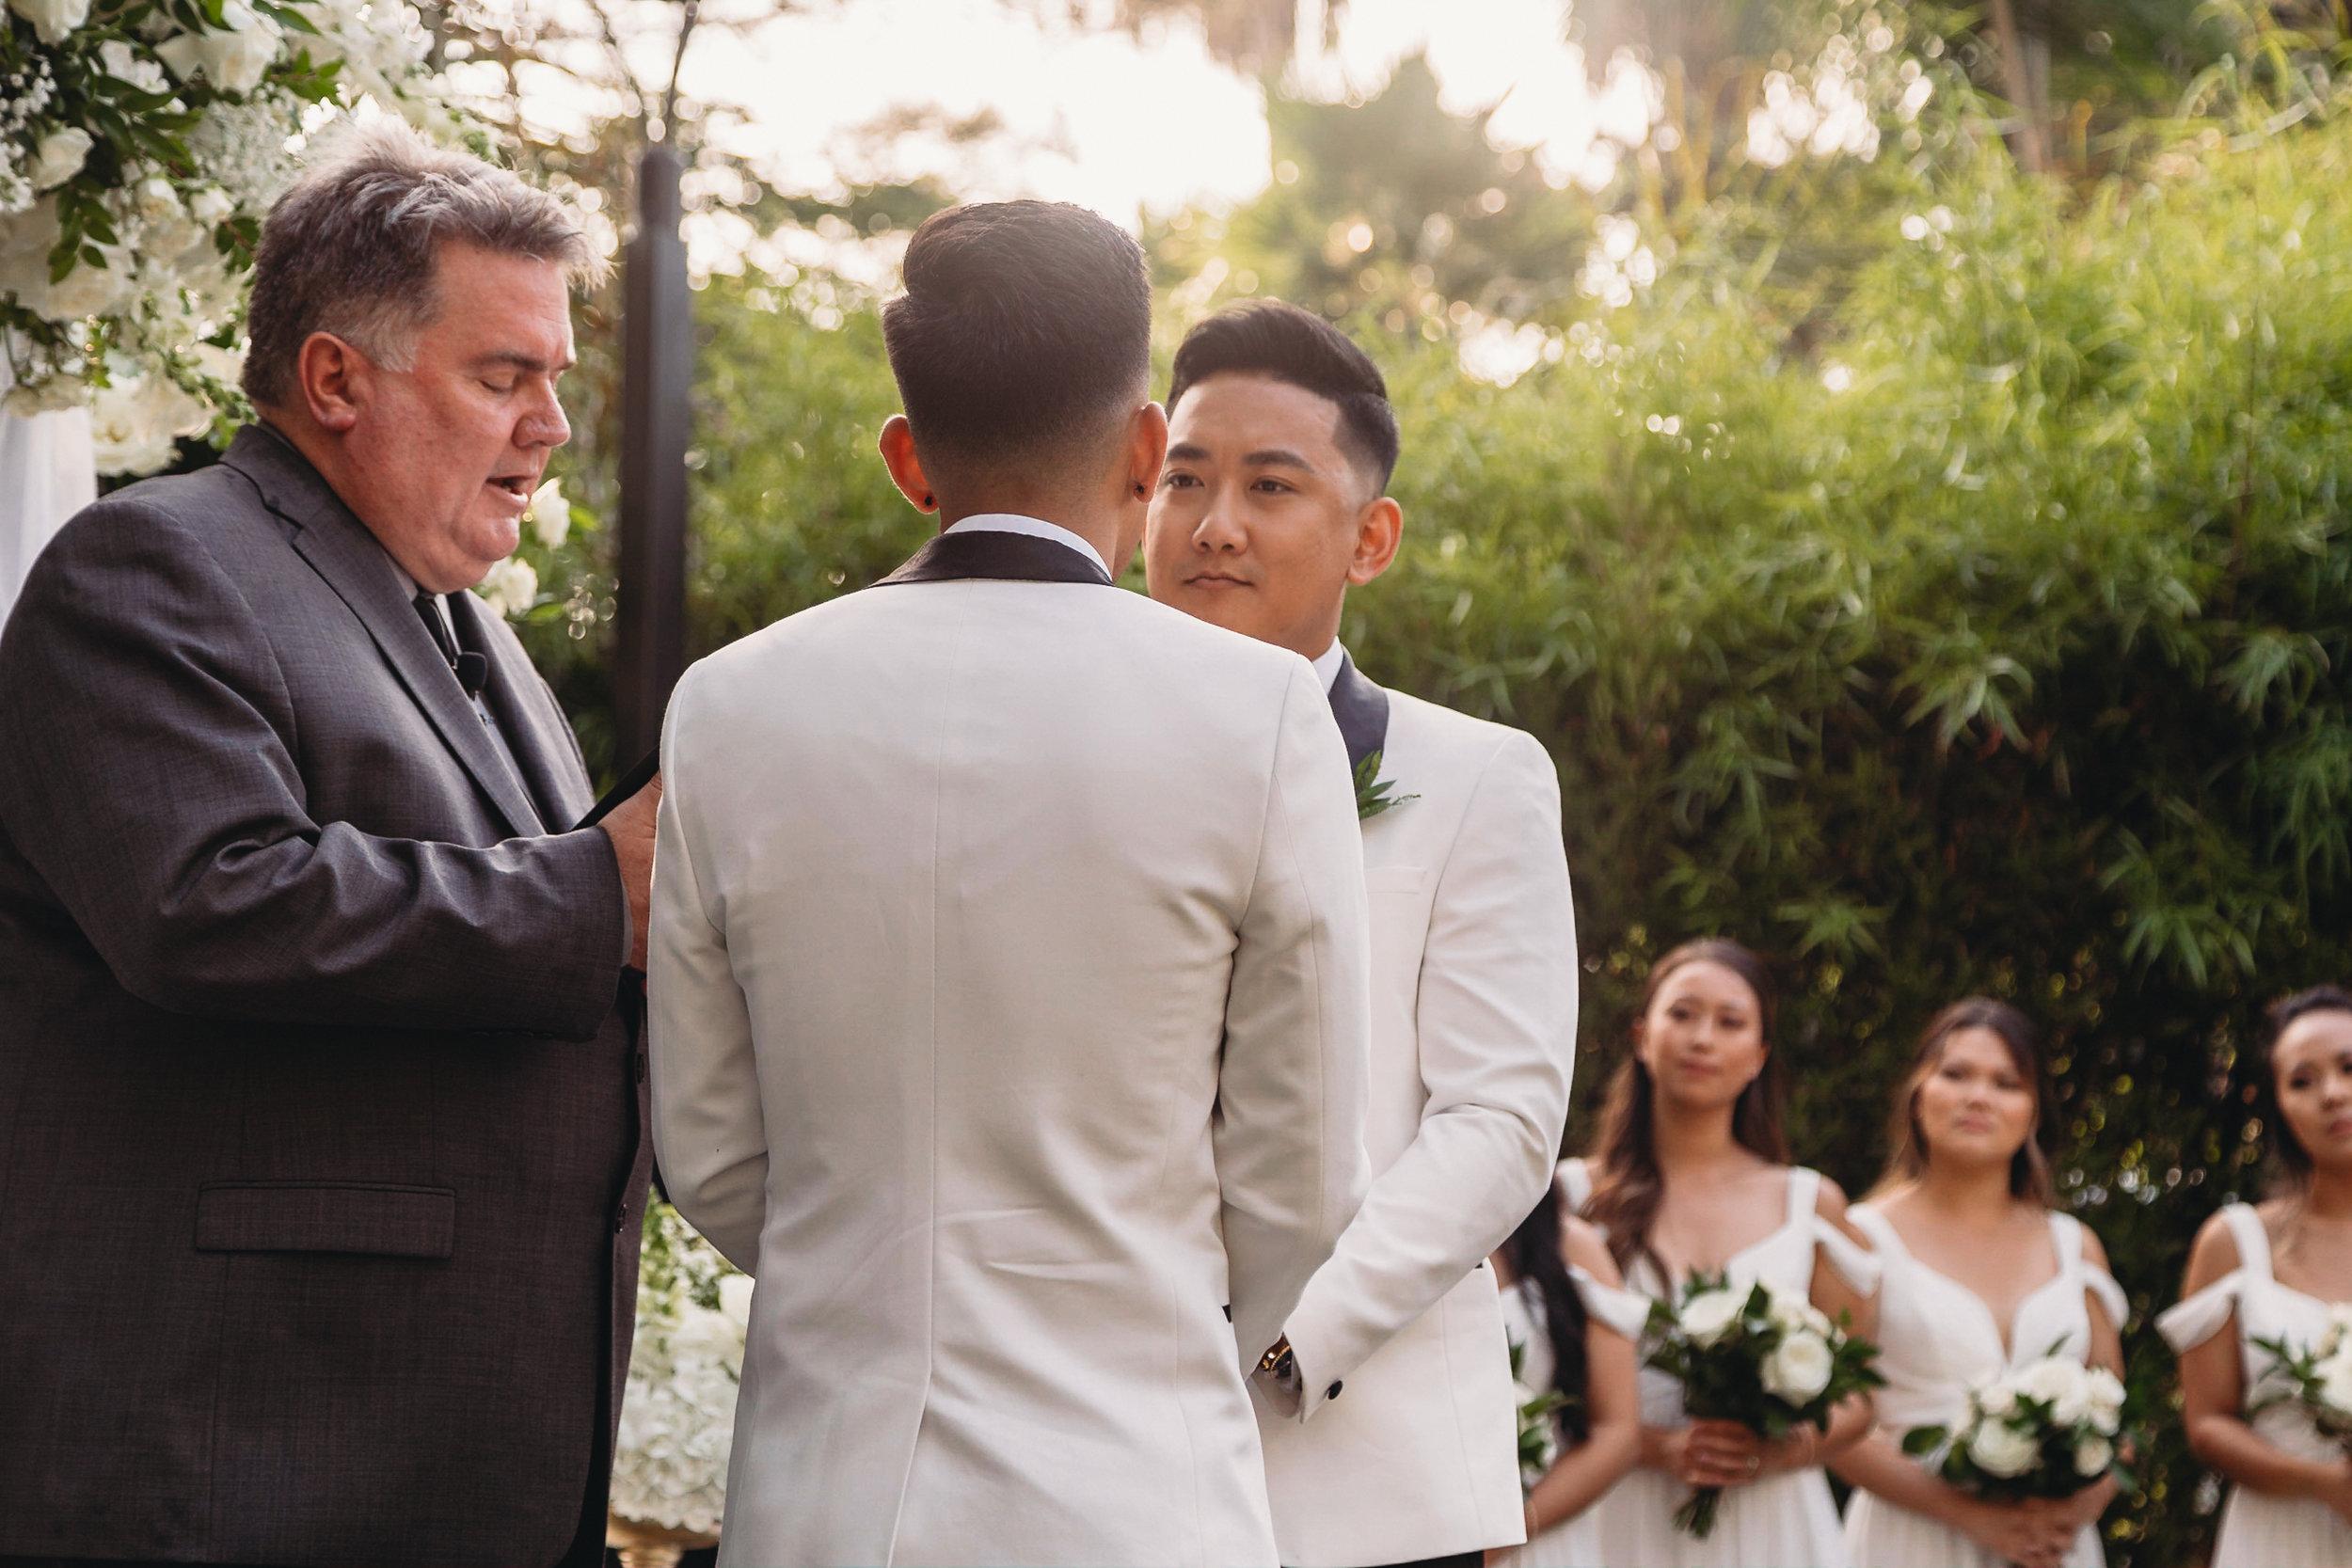 rebeccaylasotras-sandiego-lgbt-wedding-photography-36.jpg